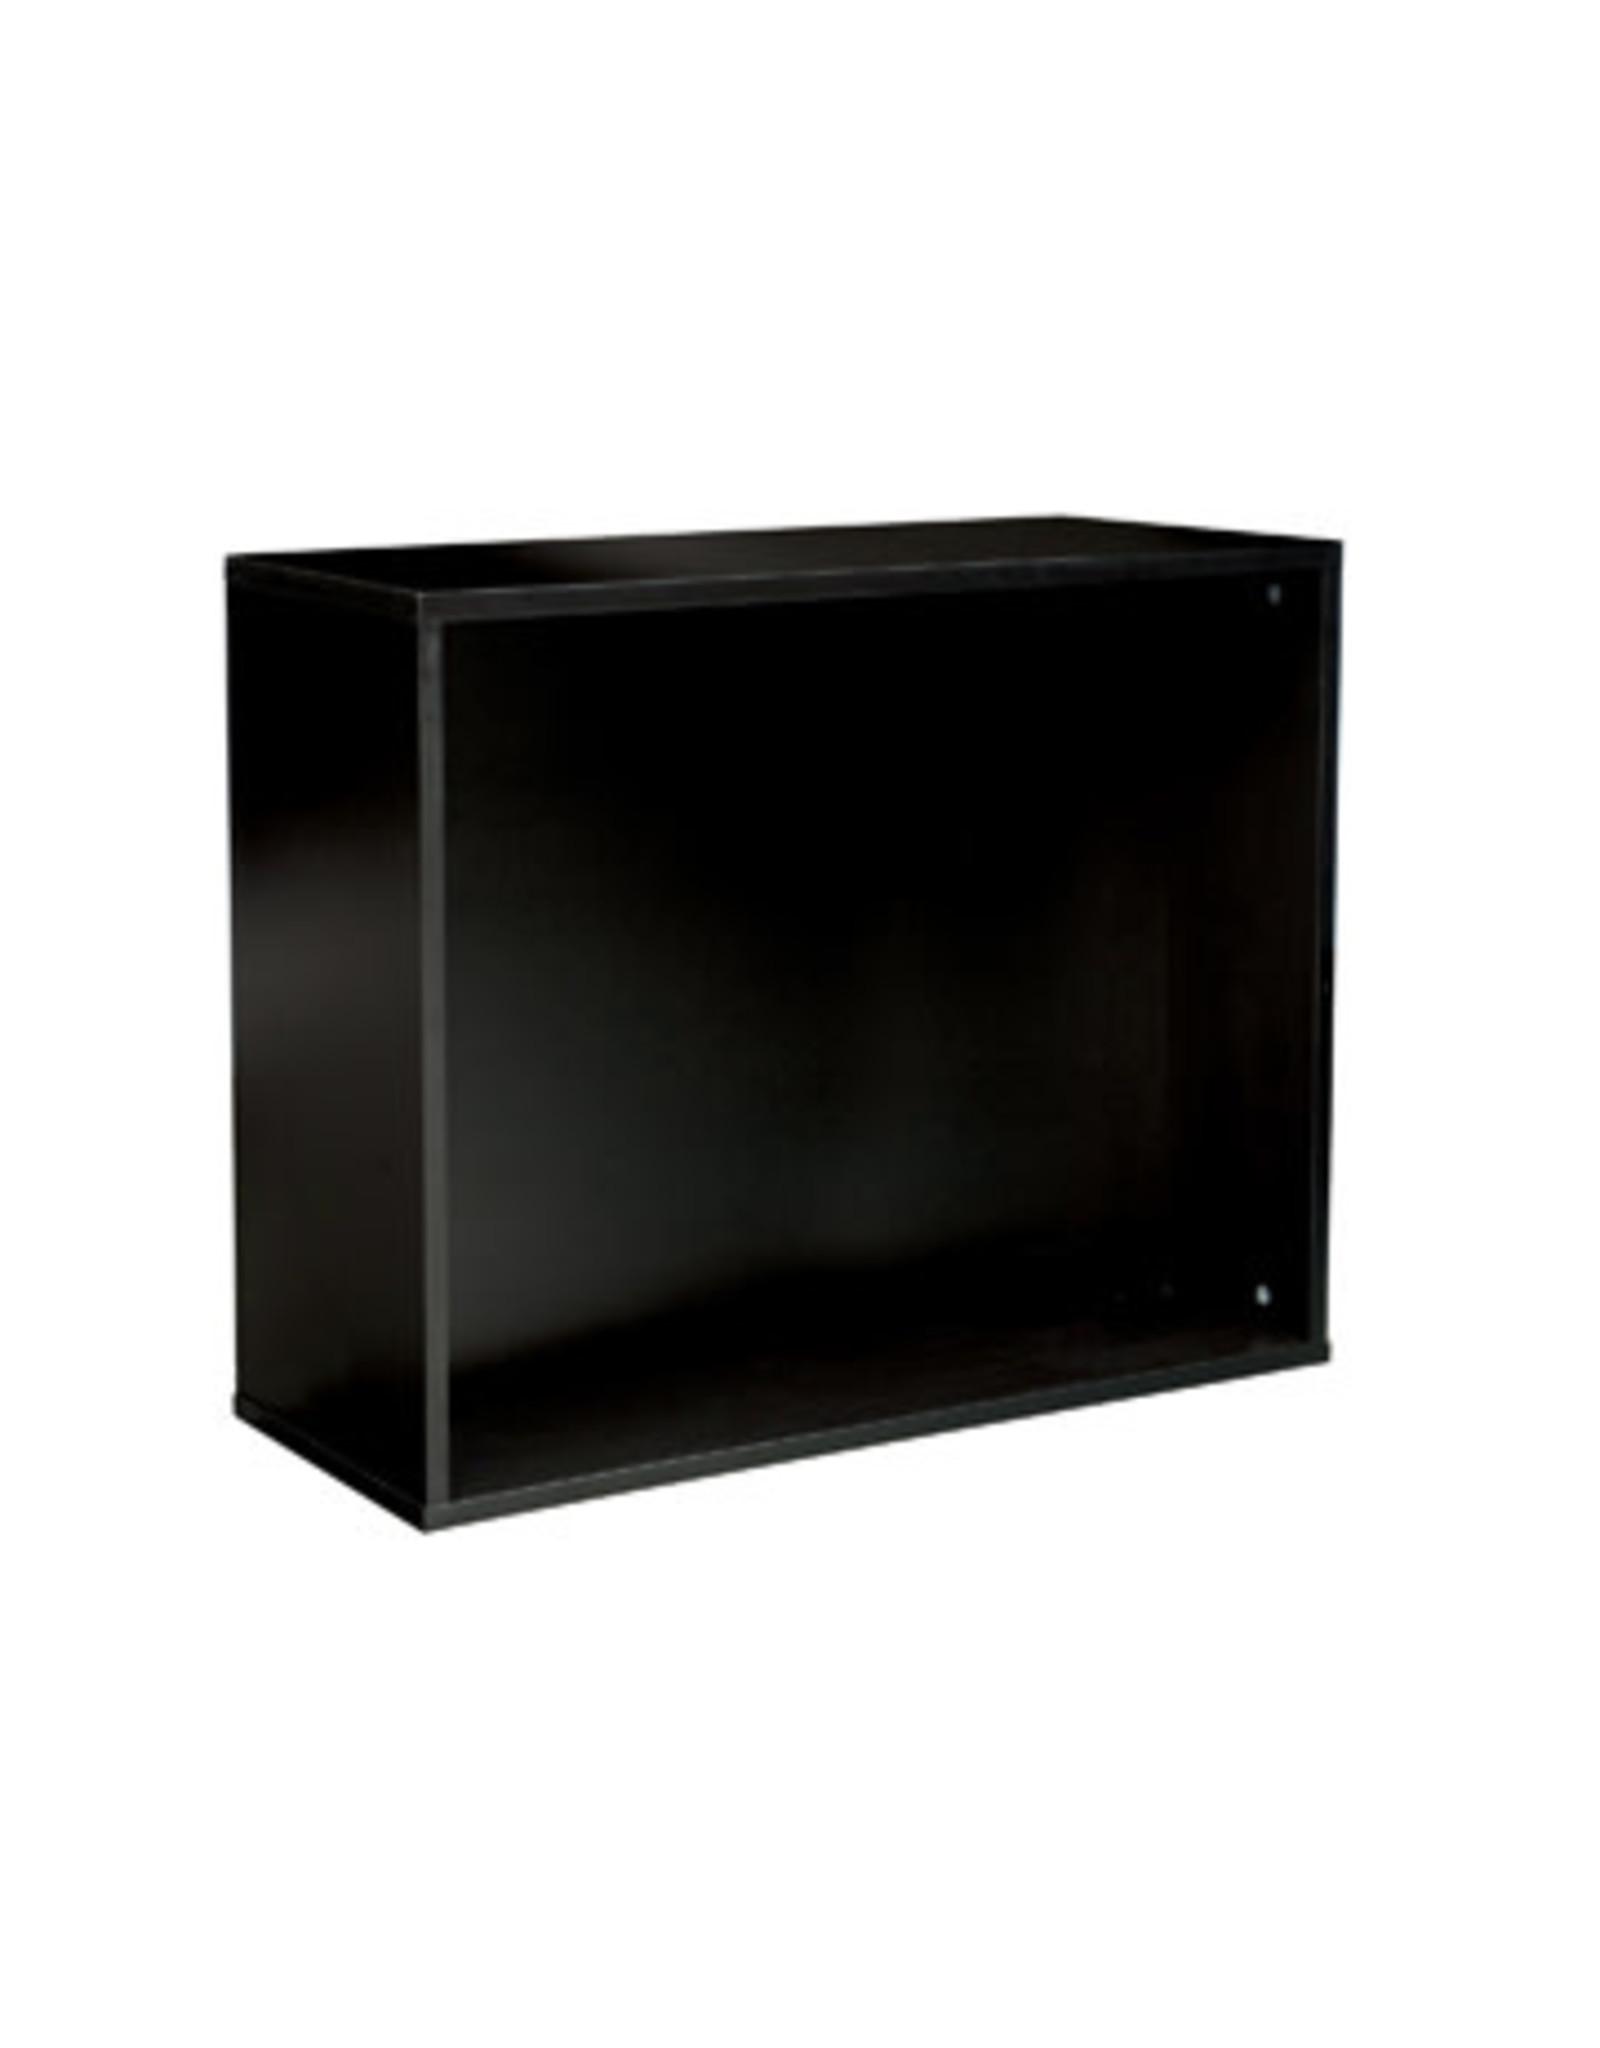 "Fluval Fluval Aquarium Stand - 29 Tall - 31"" x 13"" x 26"" (79 cm x 33 cm x 66 cm) - Black"